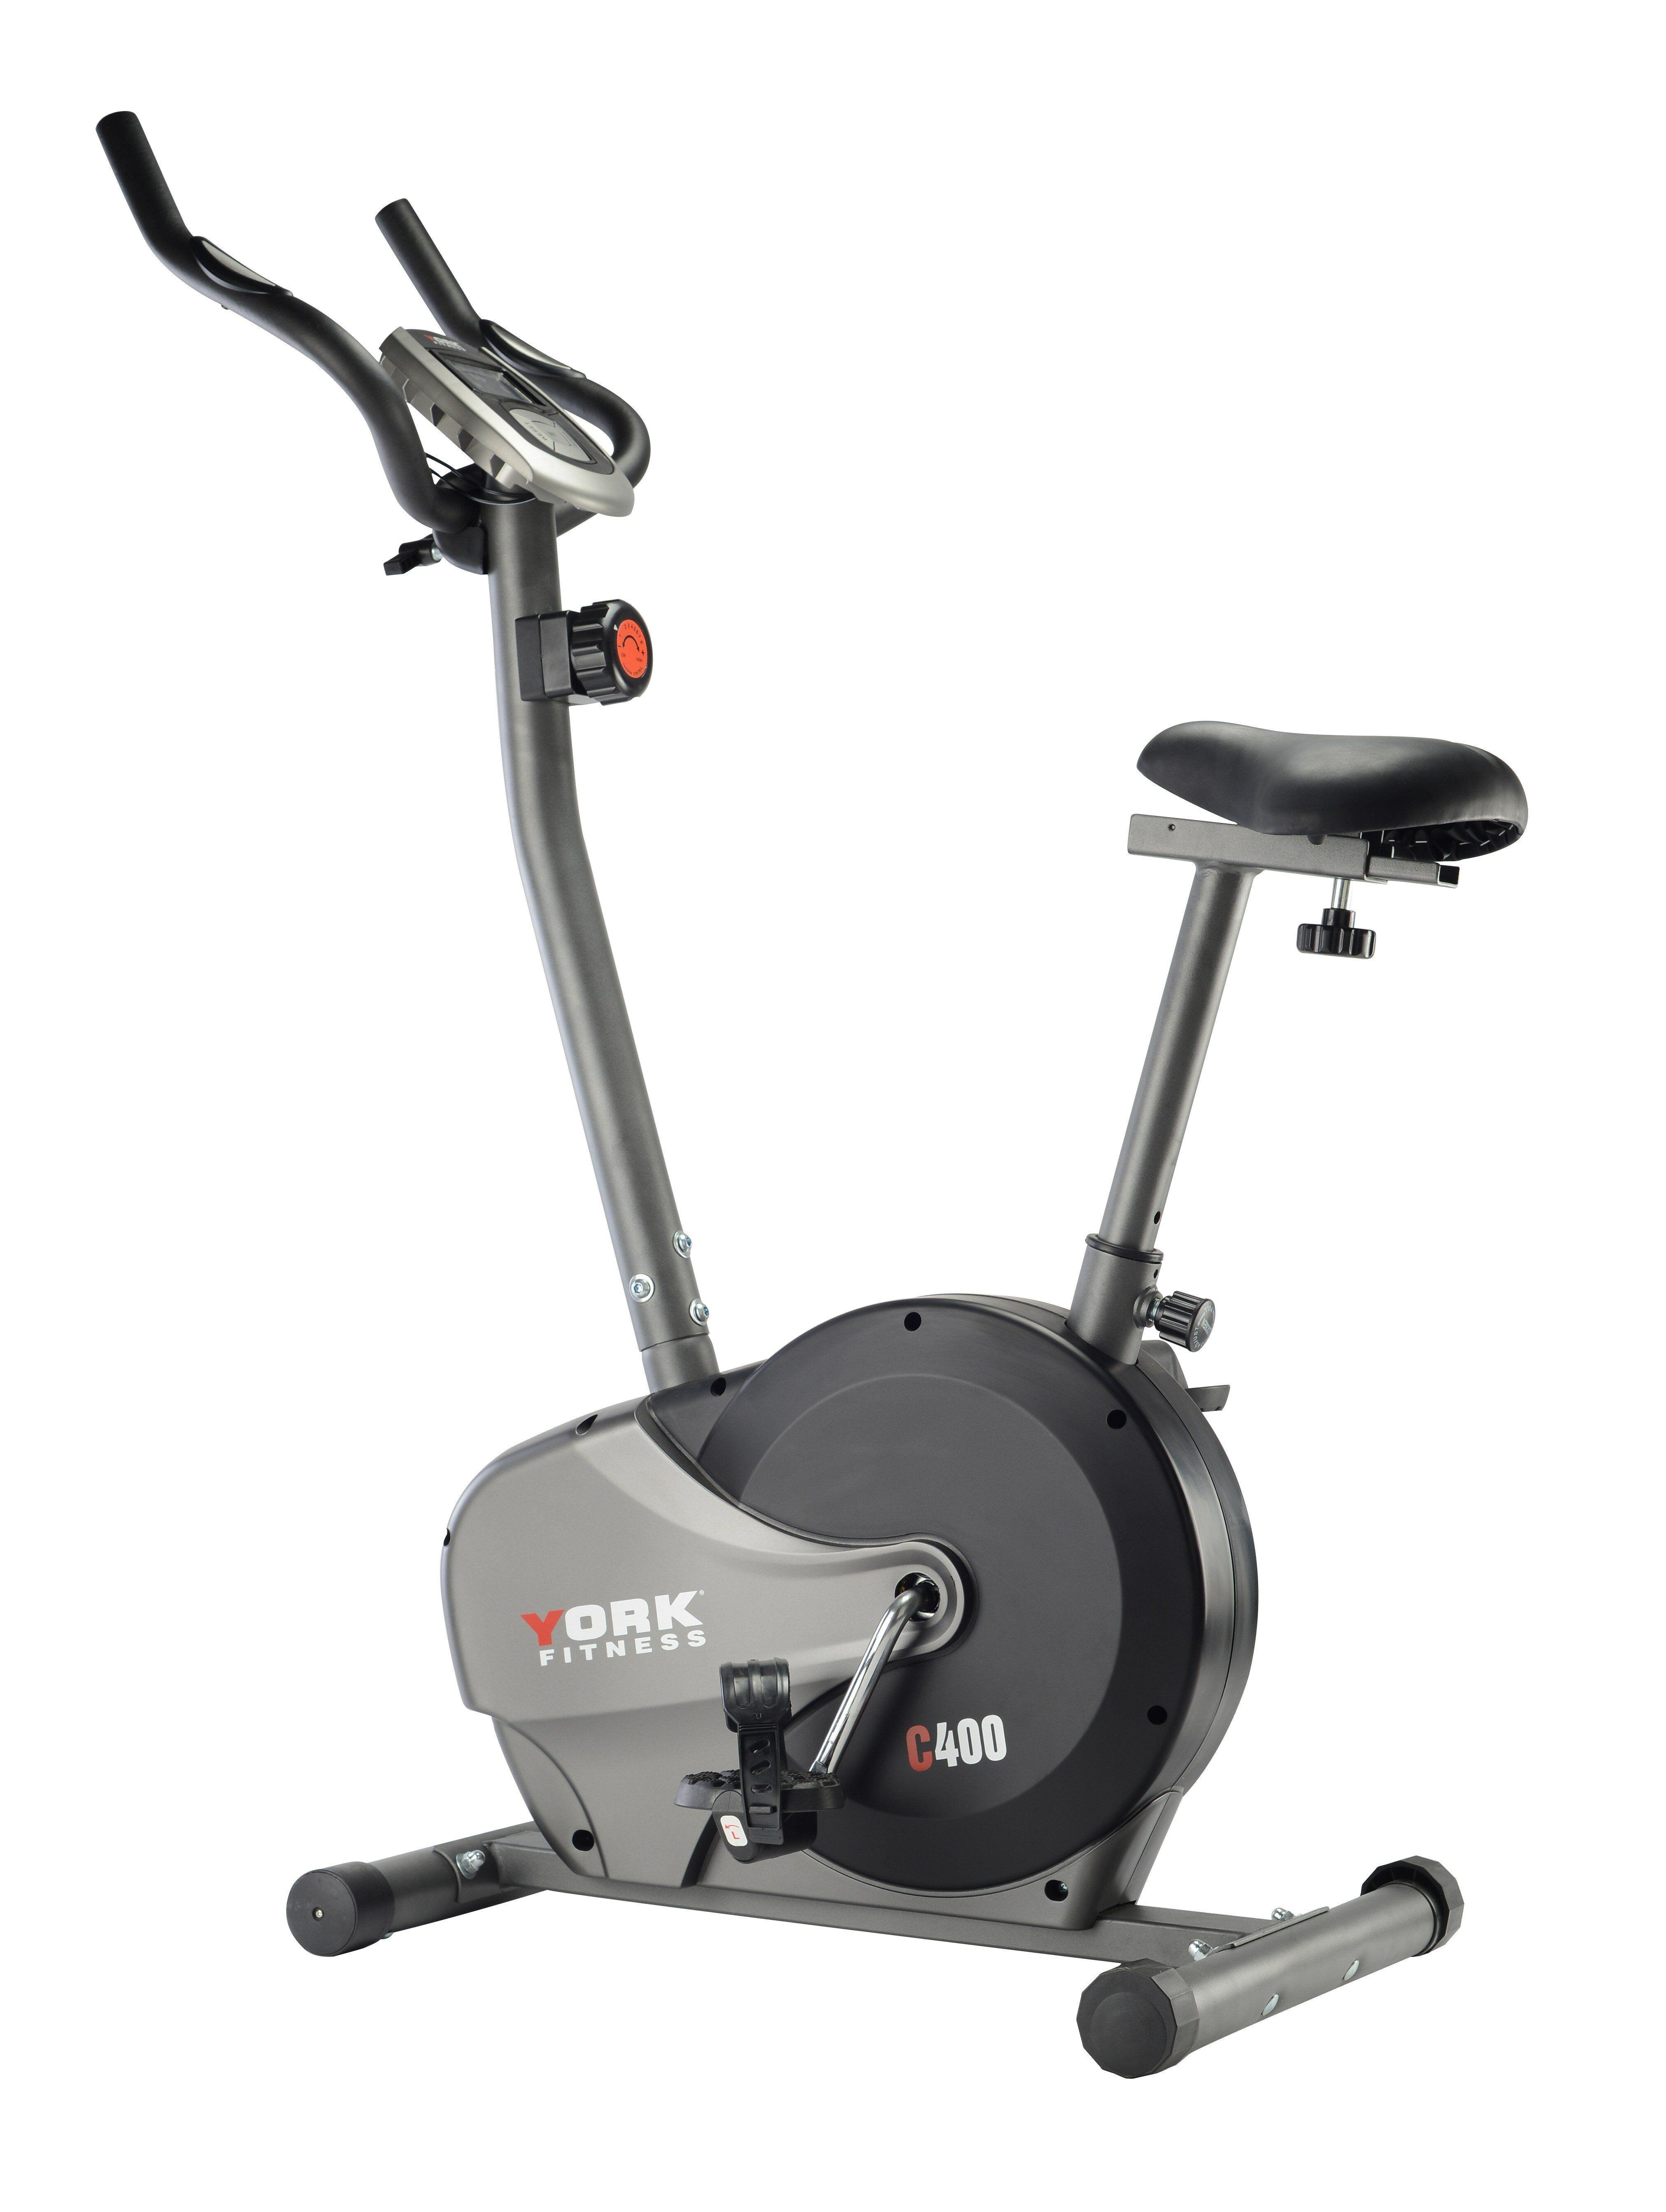 York C400 Manual Exercise Bike Biking Workout Upright Exercise Bike